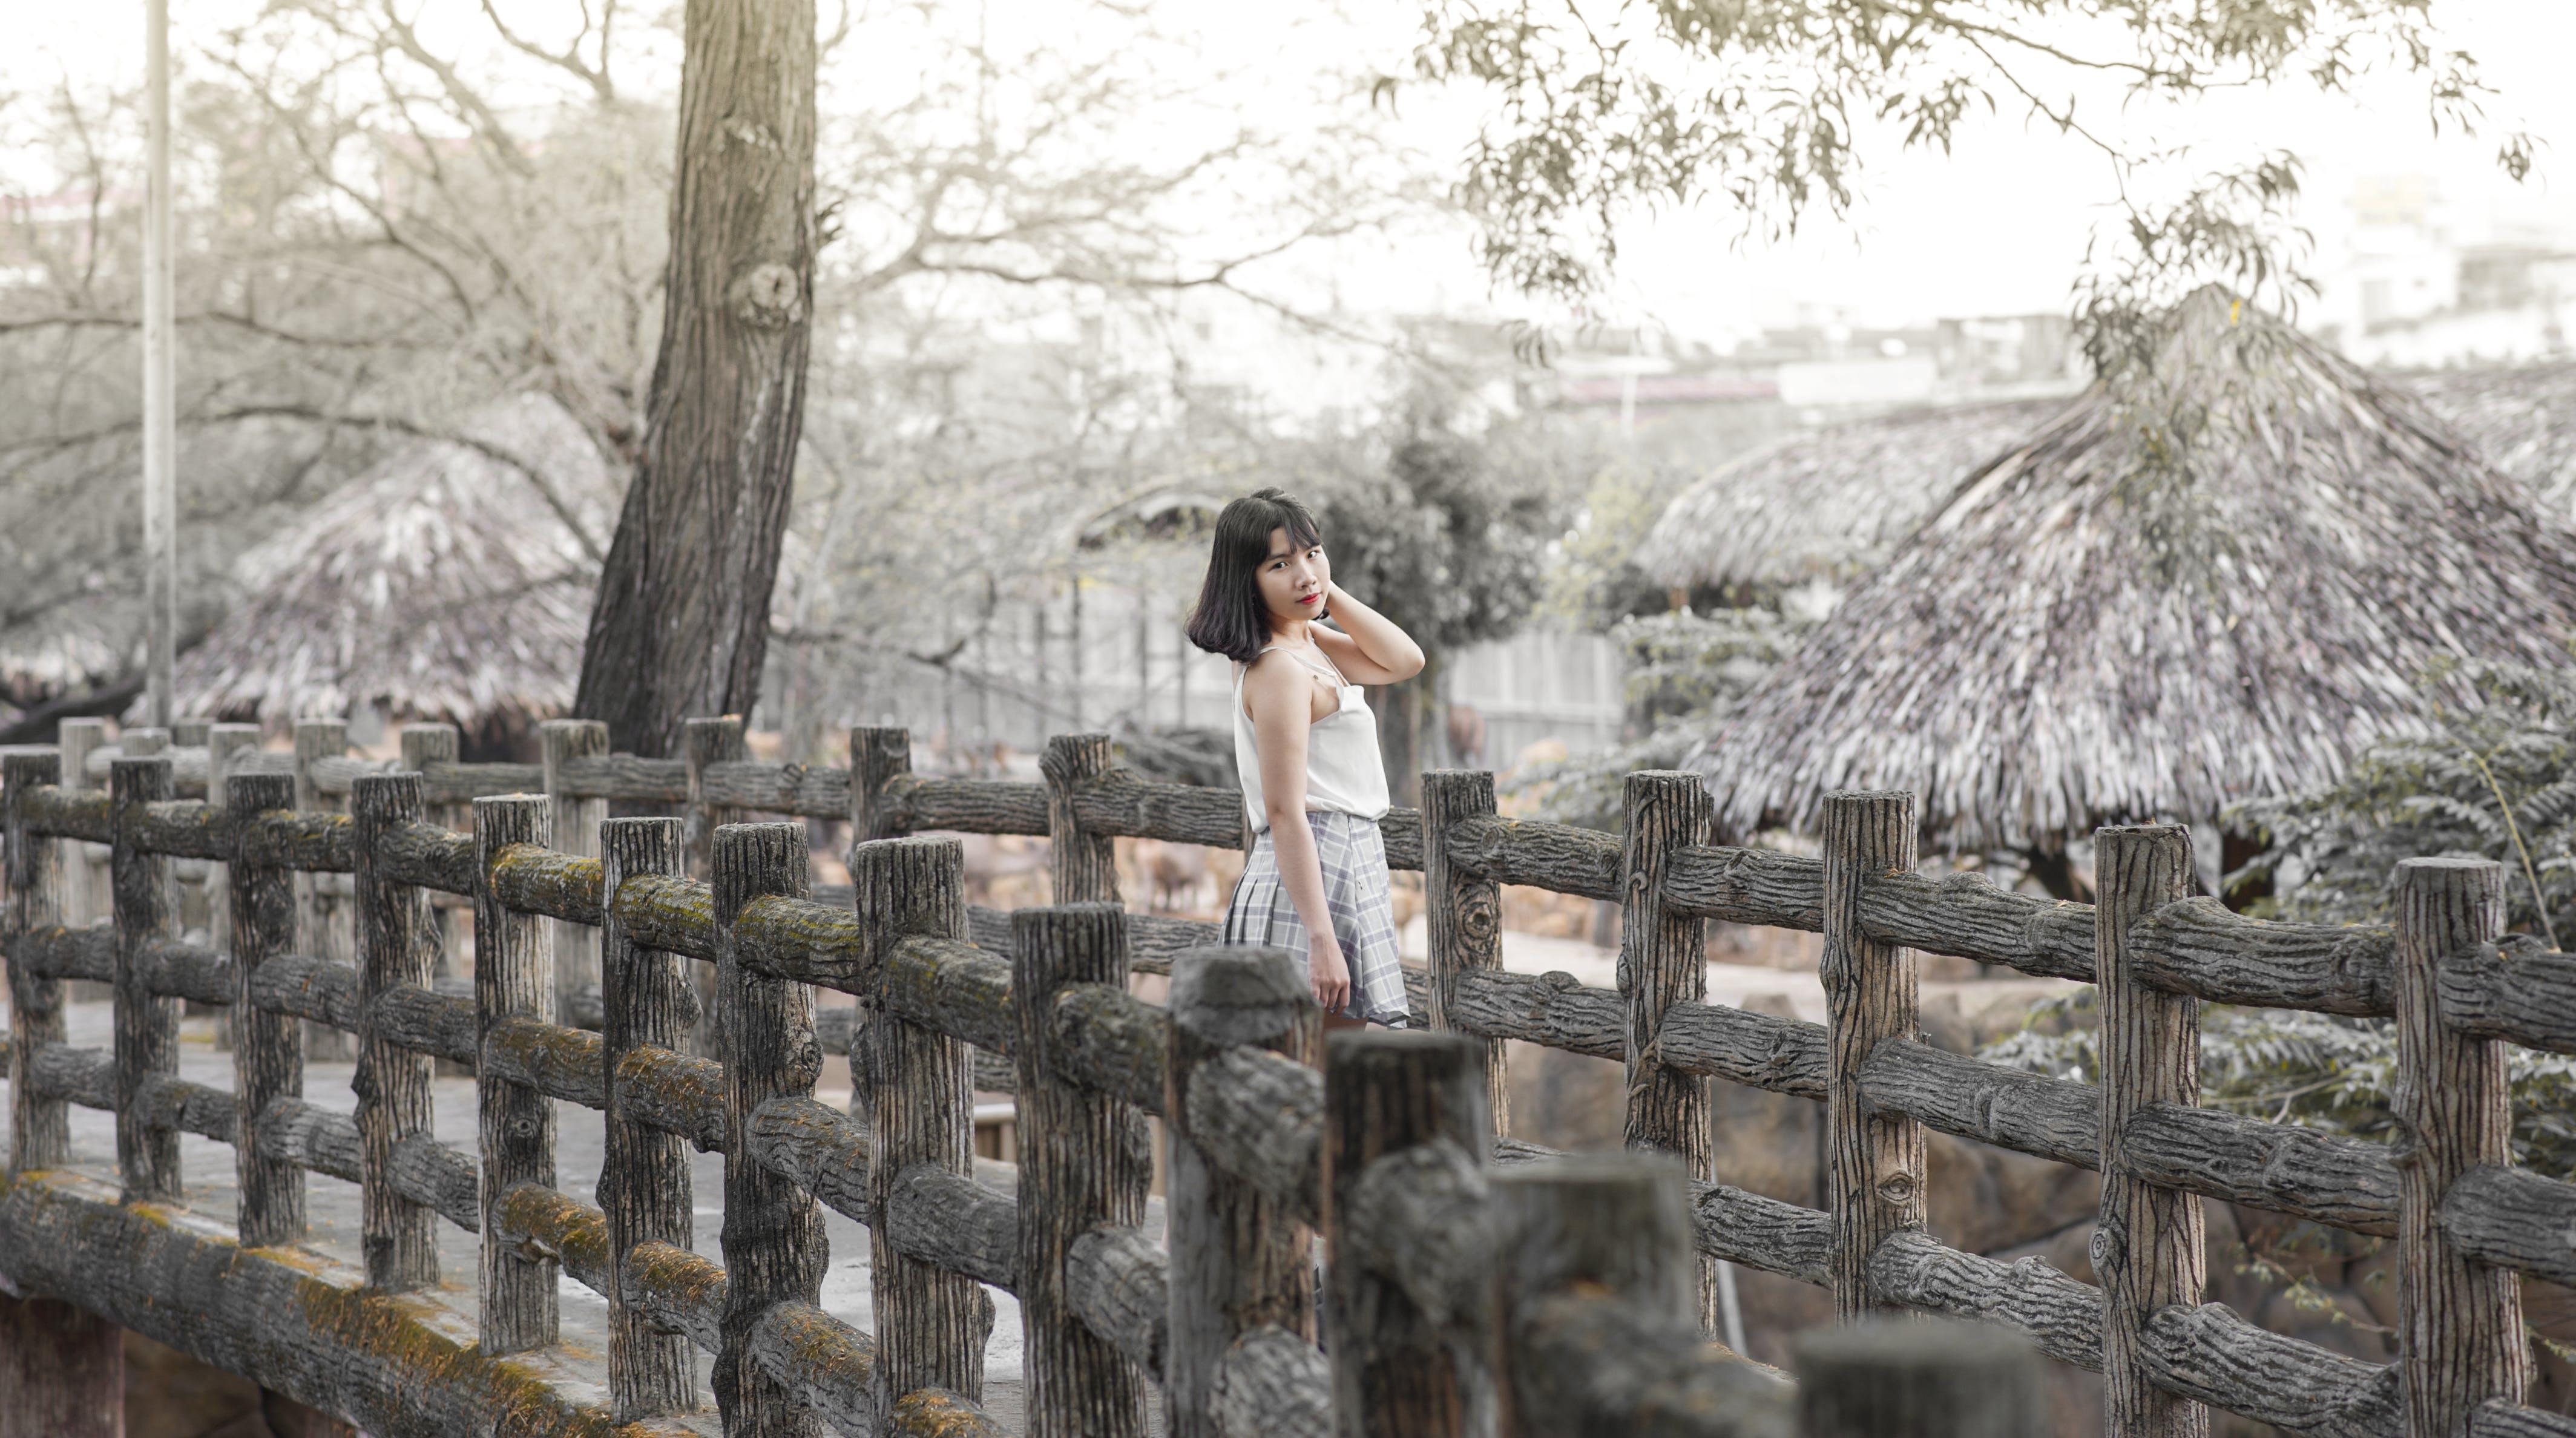 Woman Wearing White Sleeveless Dress Standing on Gray Wooden Dock